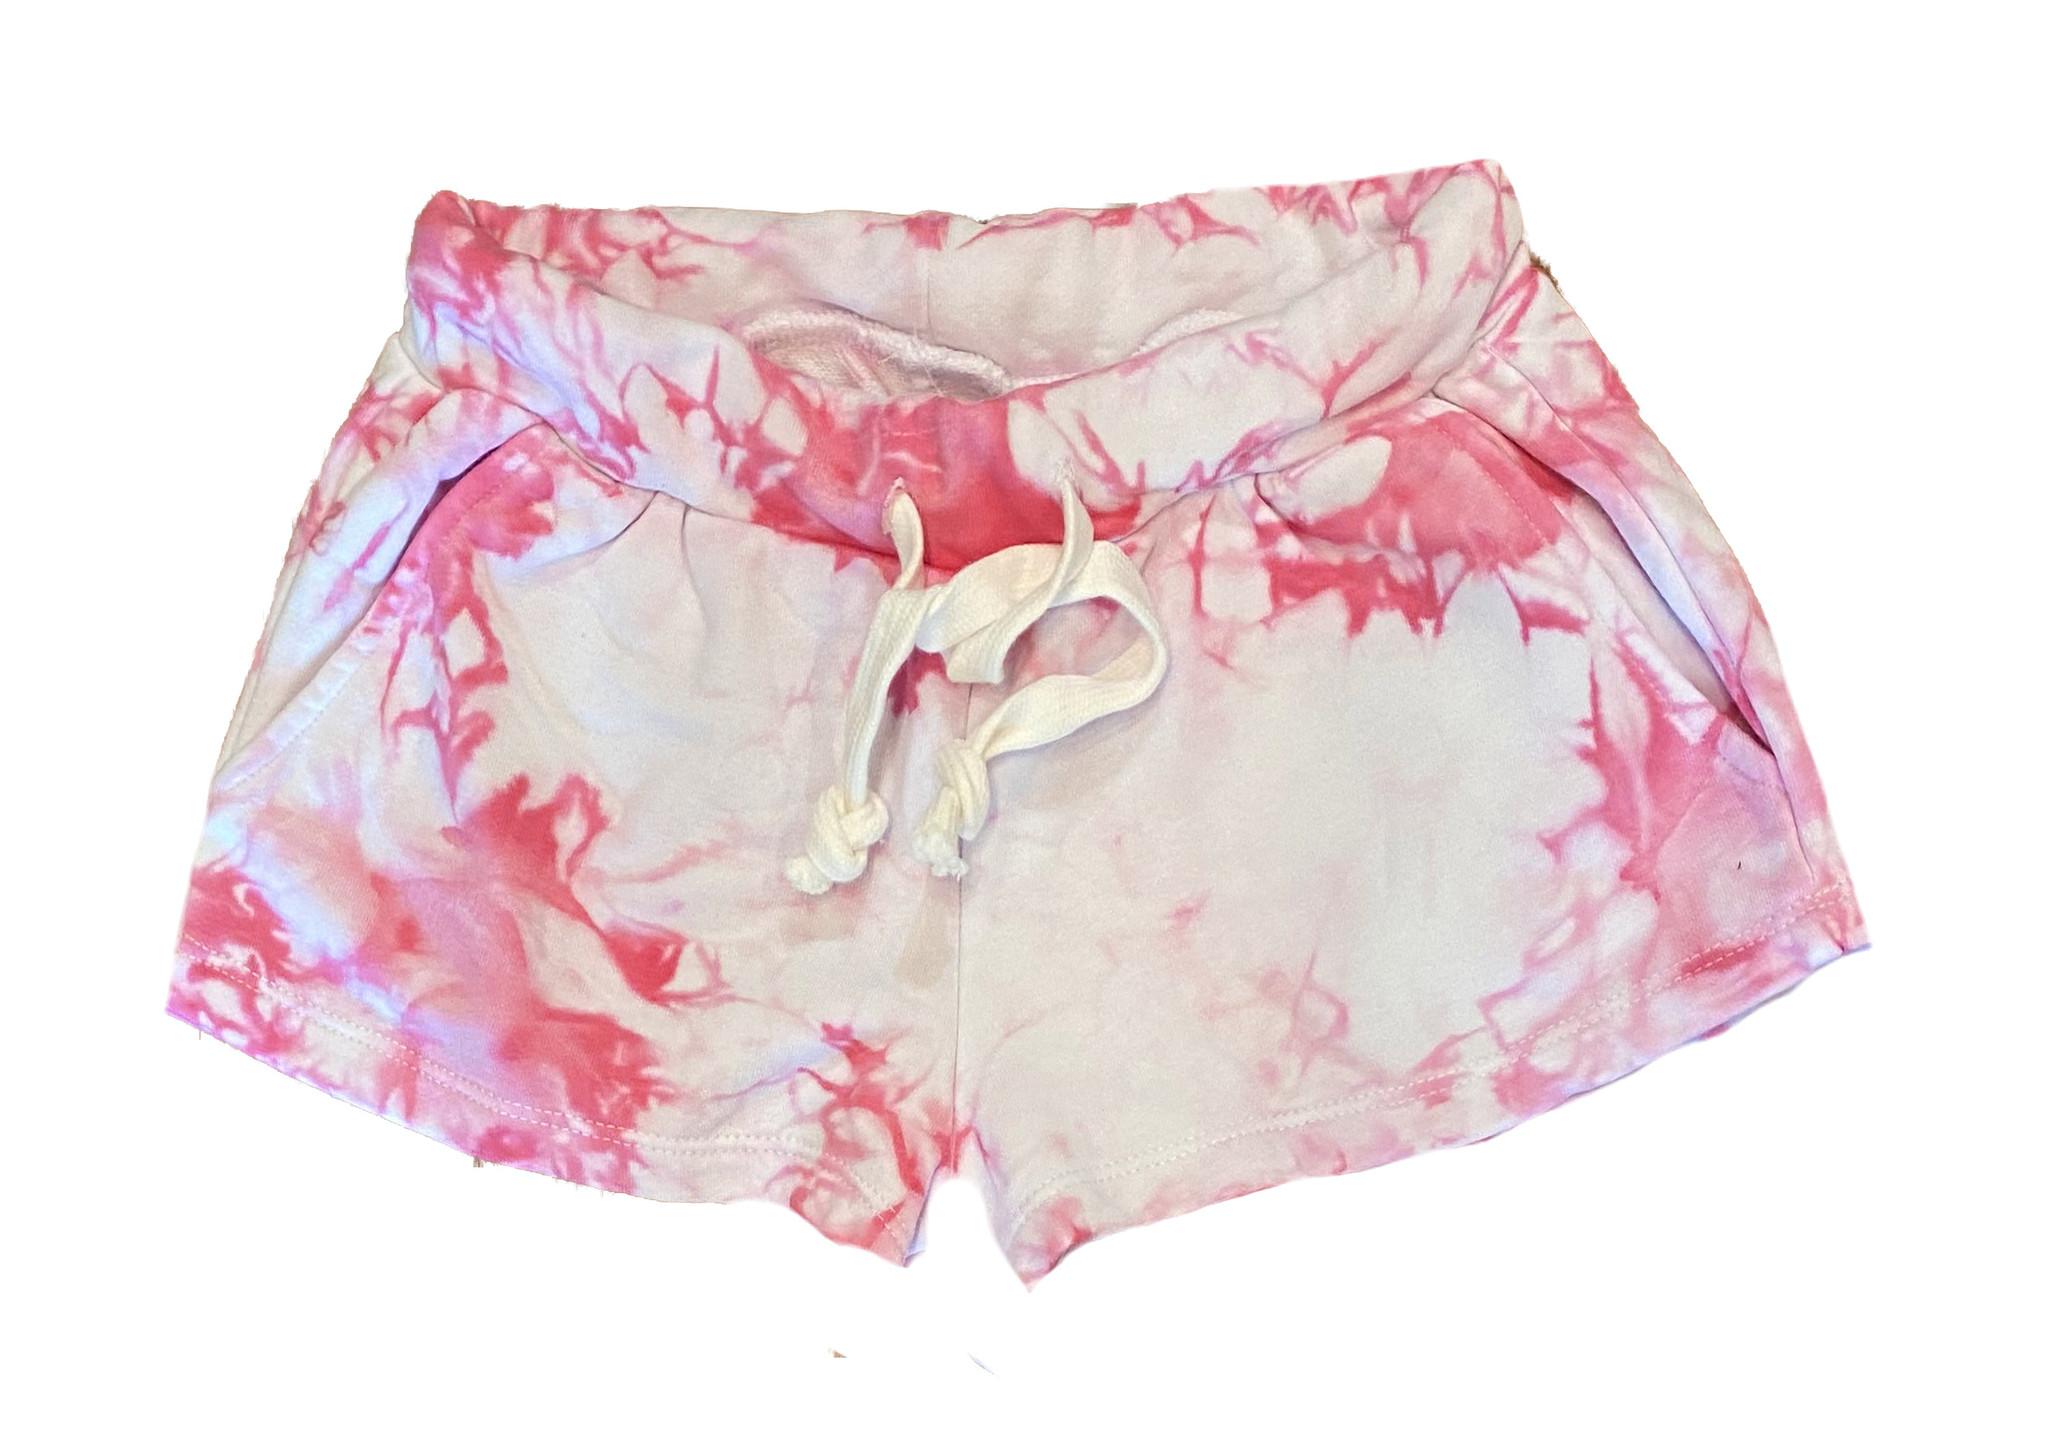 Katie J NYC Hot Pink TD Shorts